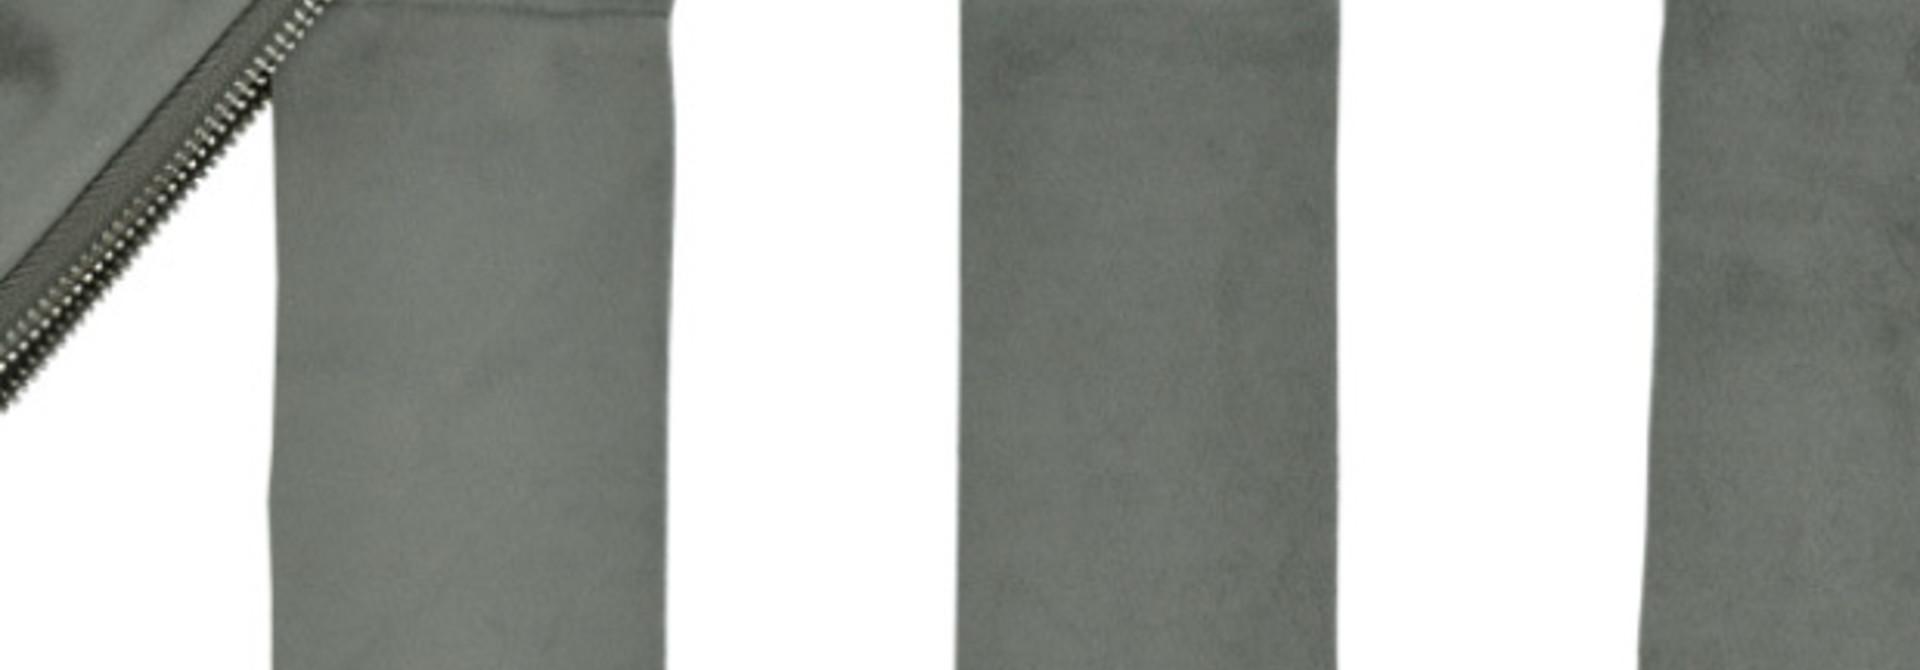 Slinger fluweel olijf 4 M - Delight Department